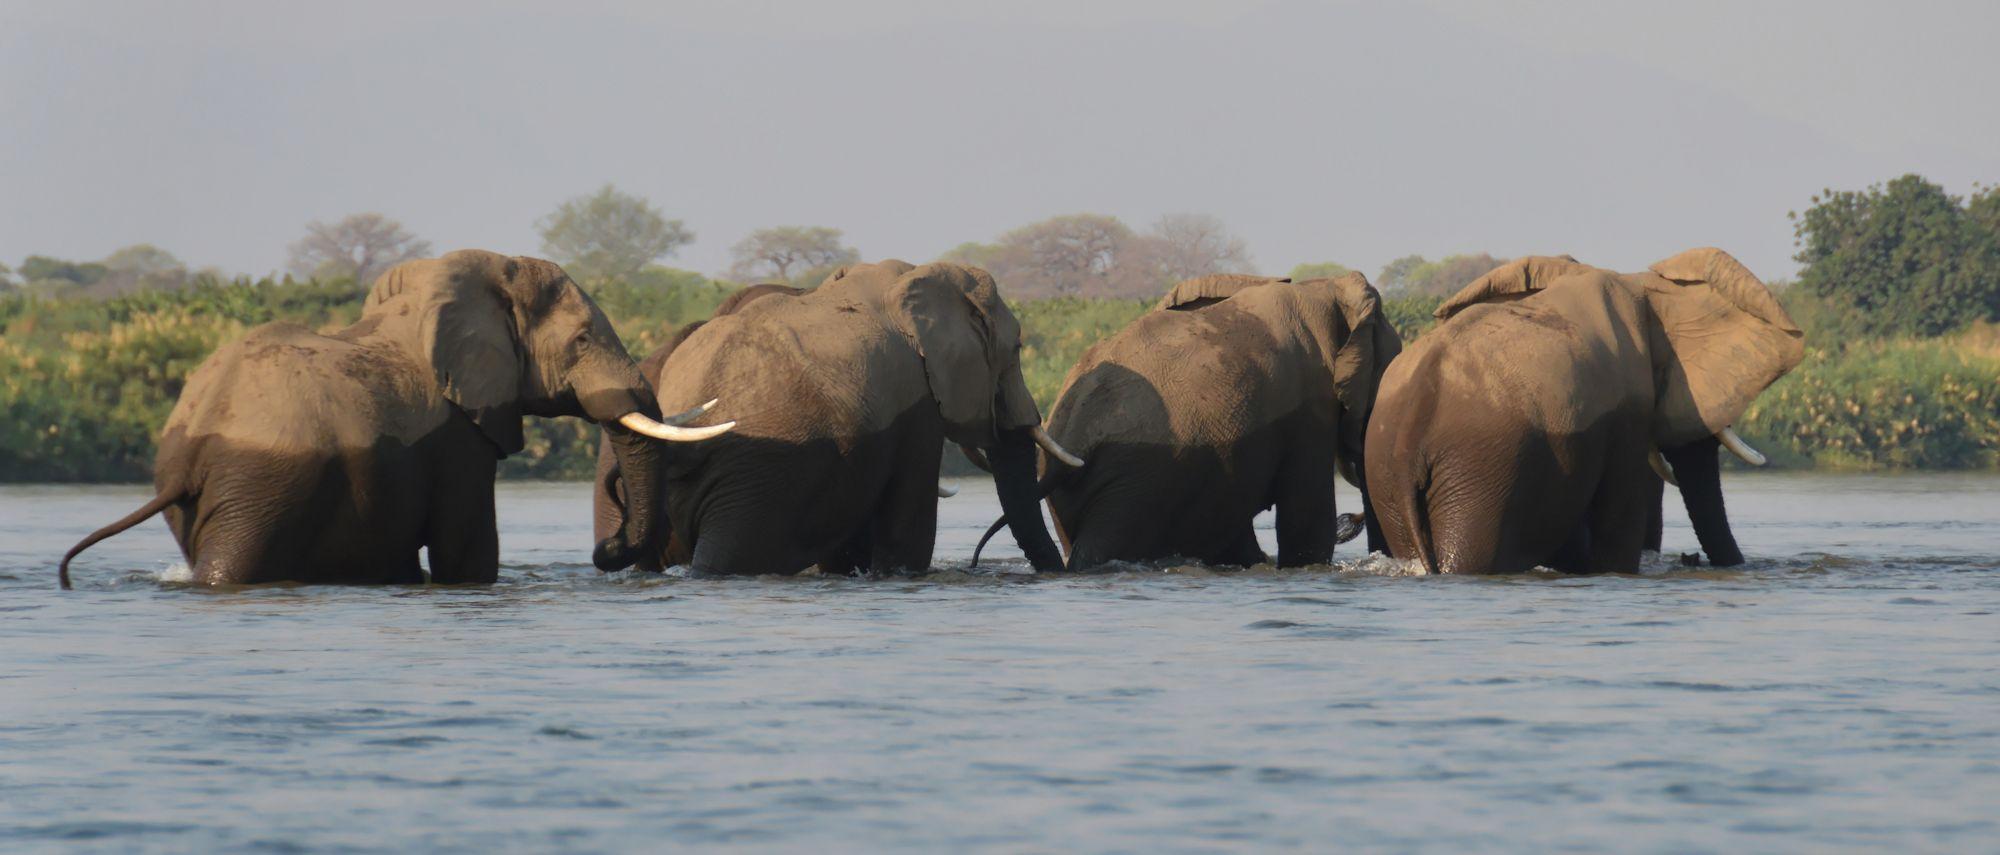 Zambezi - Elepants in the River